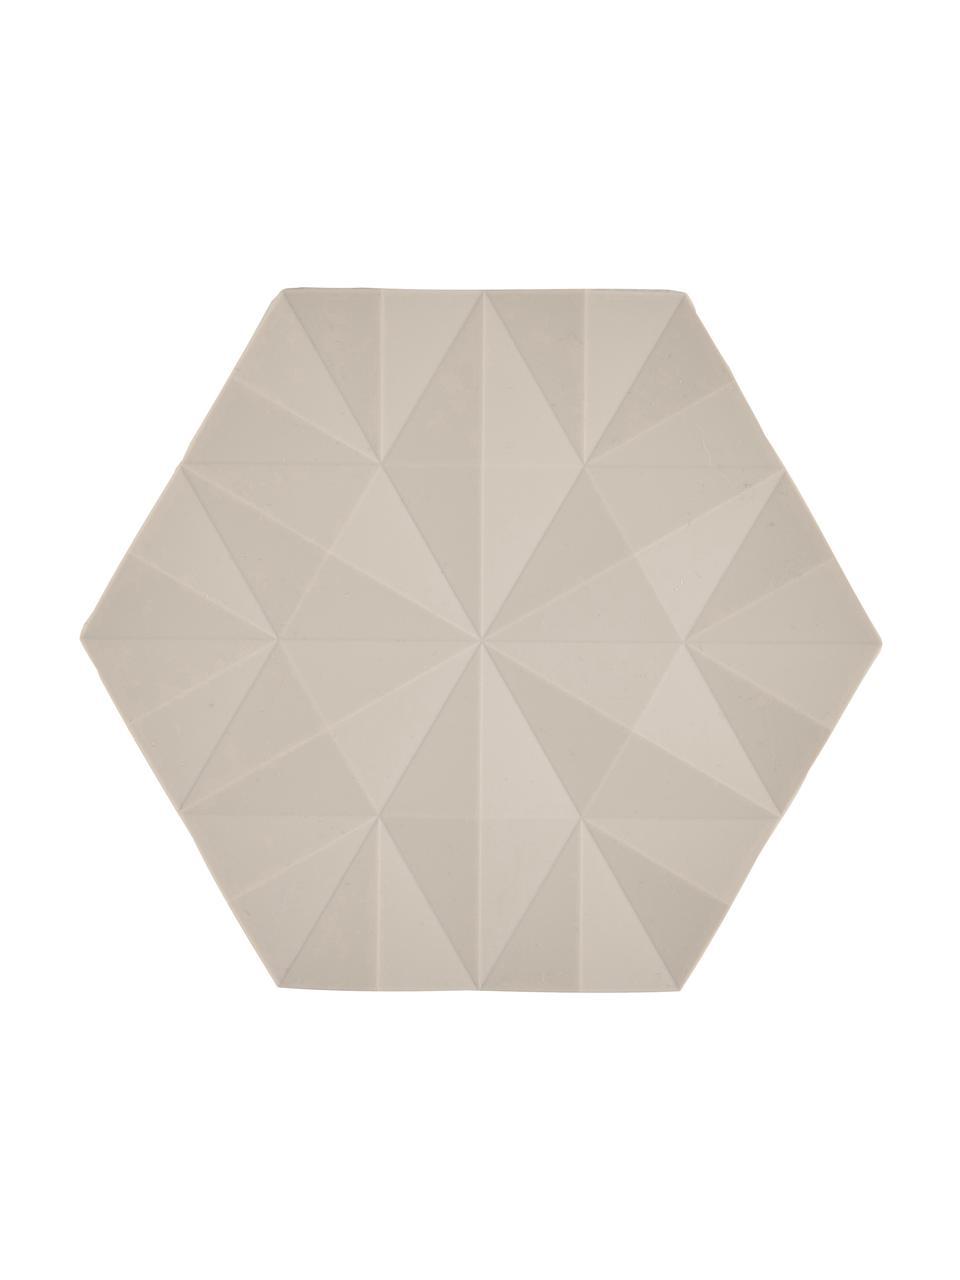 Topfuntersetzer Ori in Beige, 2 Stück, Silikon, Beige, 14 x 16 cm